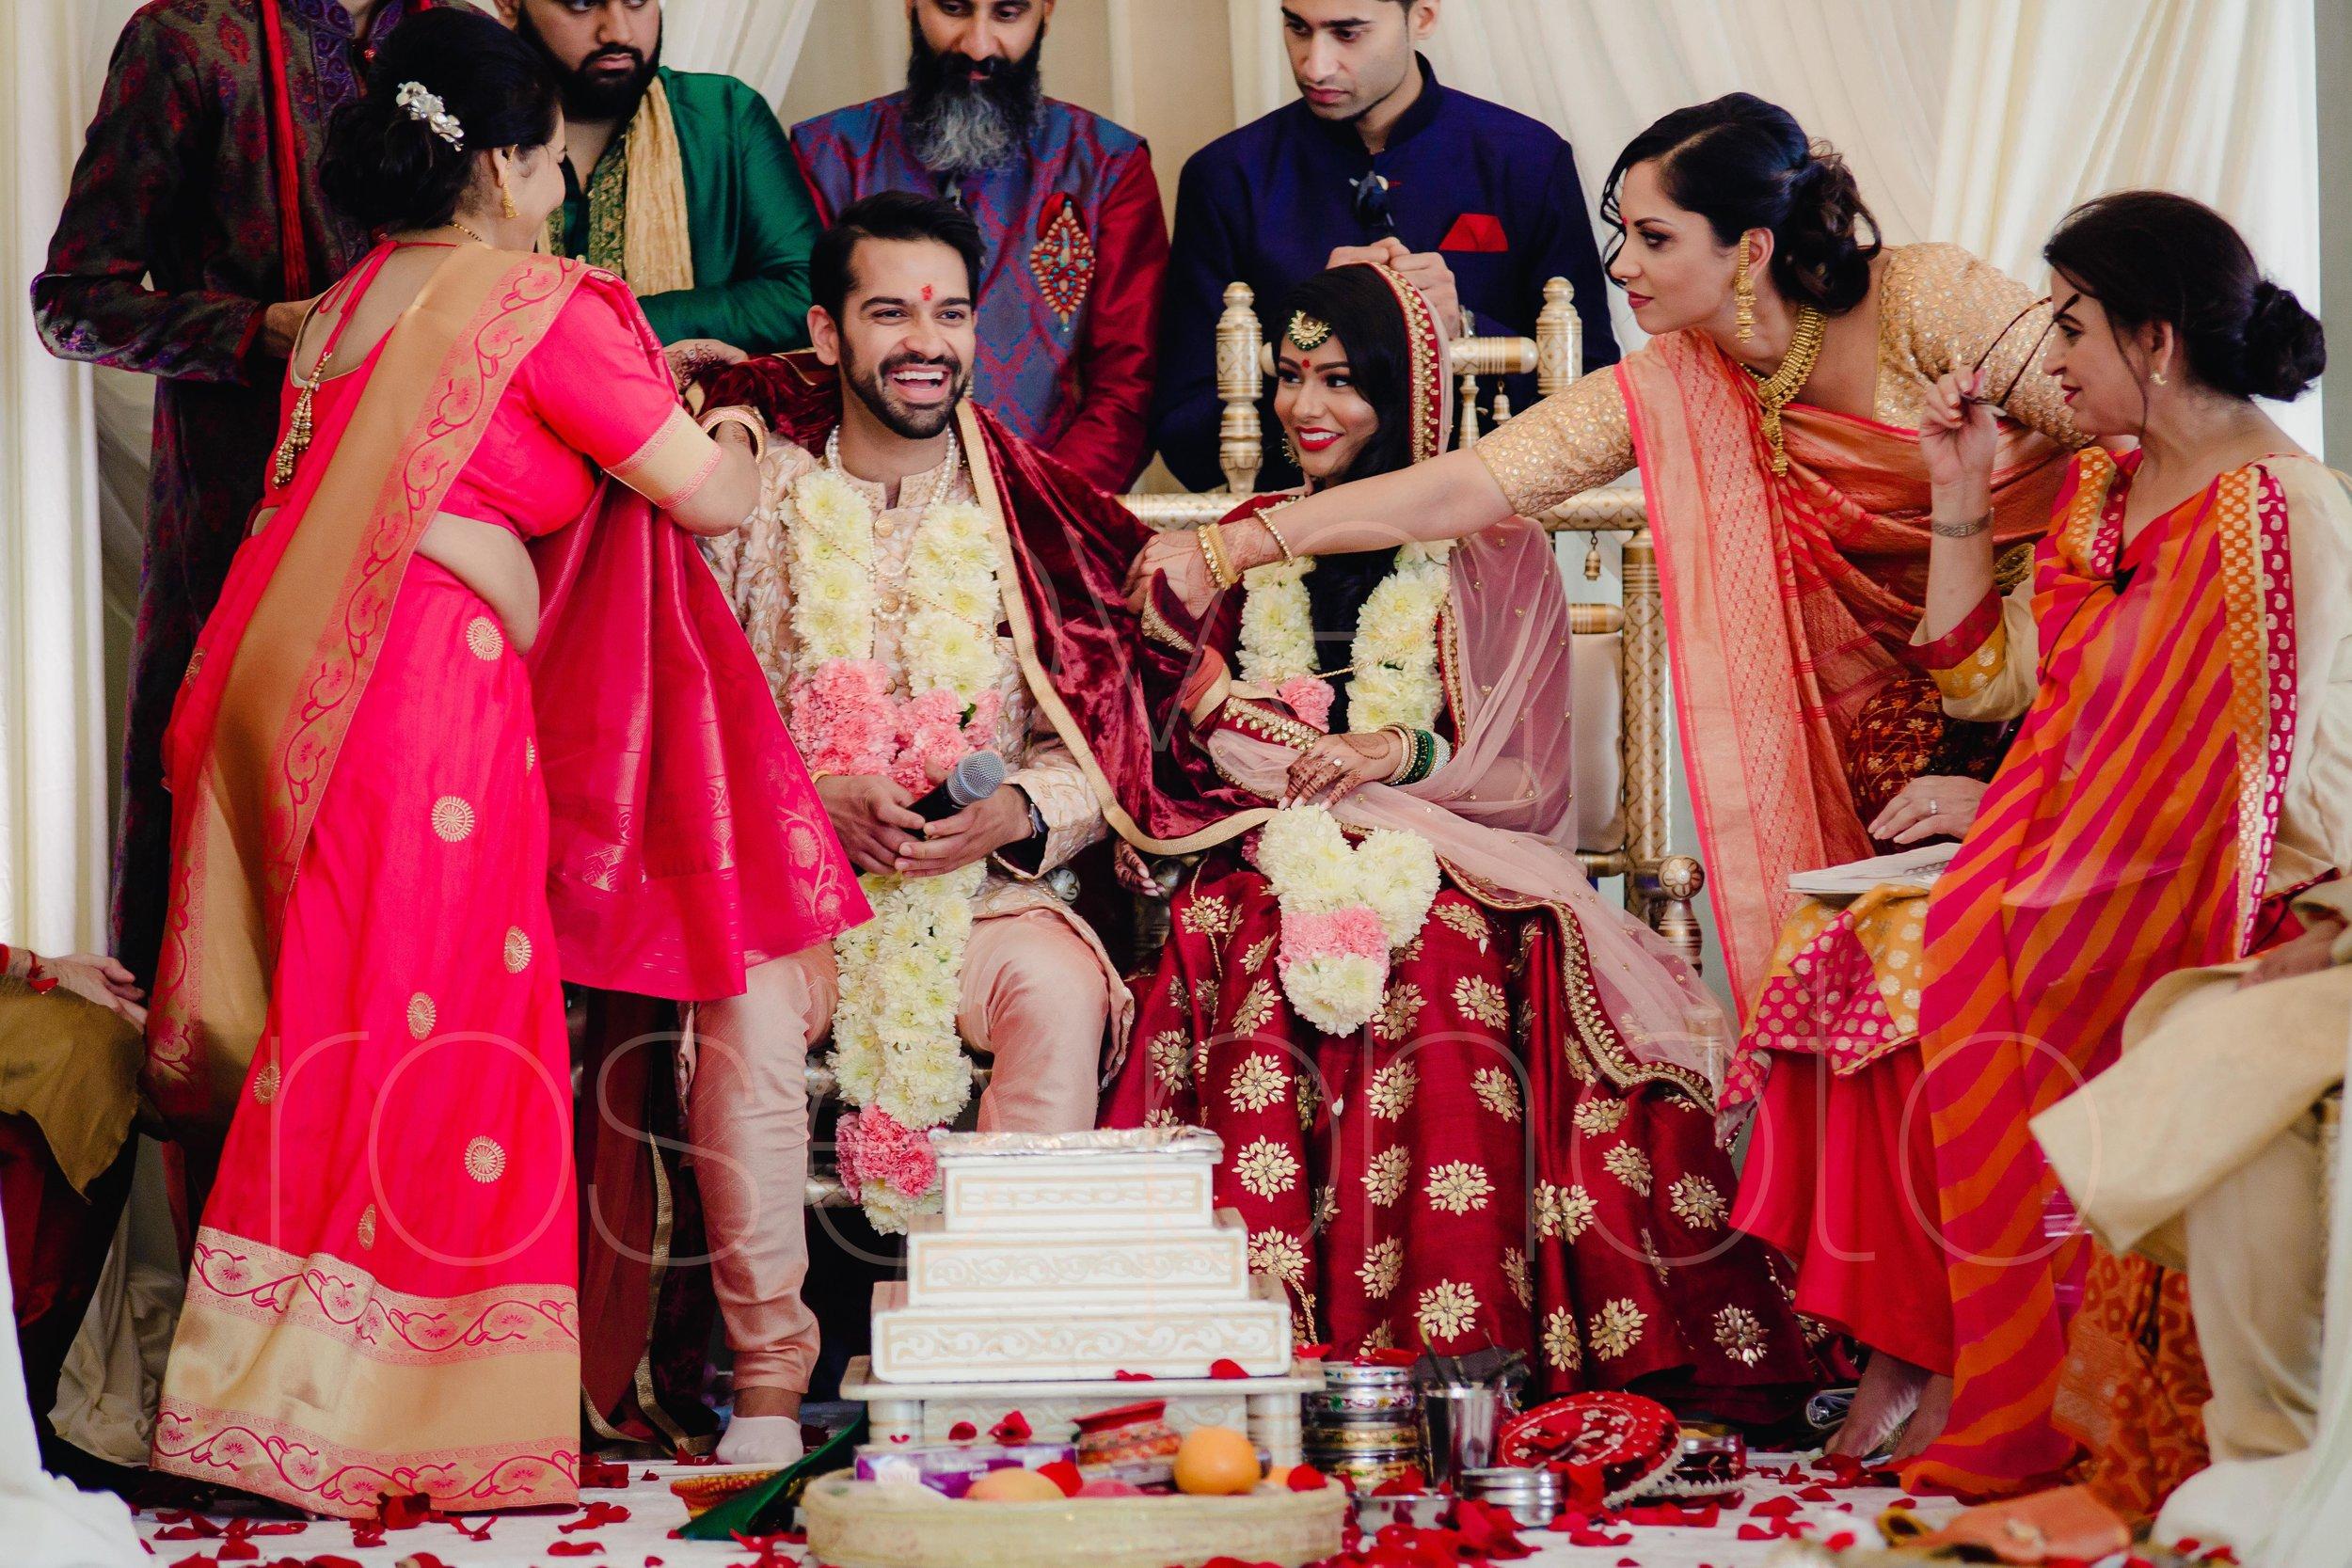 Chicago Indian Wedding best photography lifestyle wedding portrait luxury wedding-38.jpg